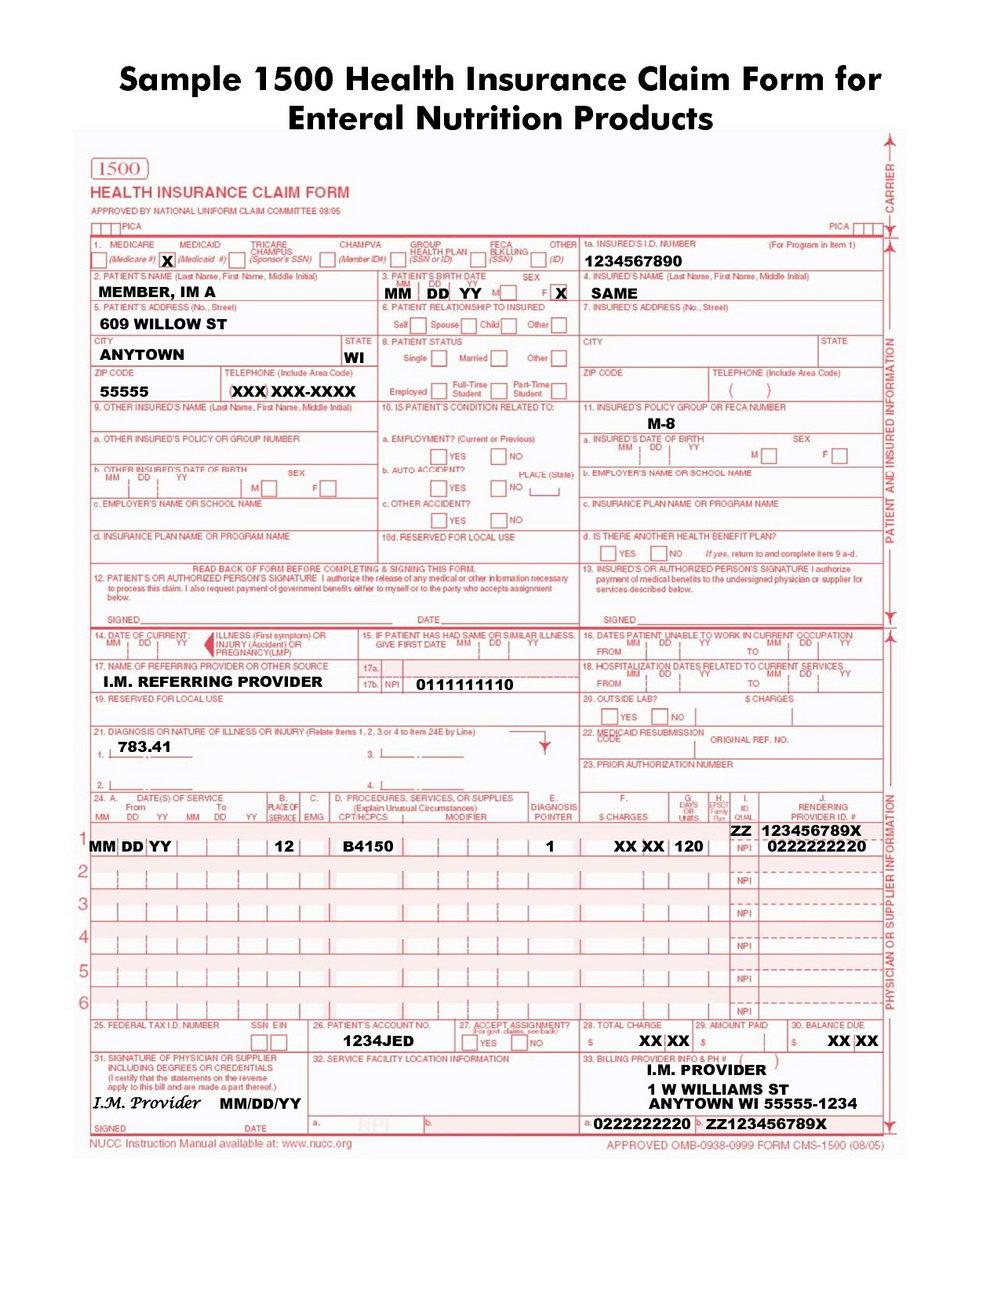 Hcfa 1500 Form Box 24j